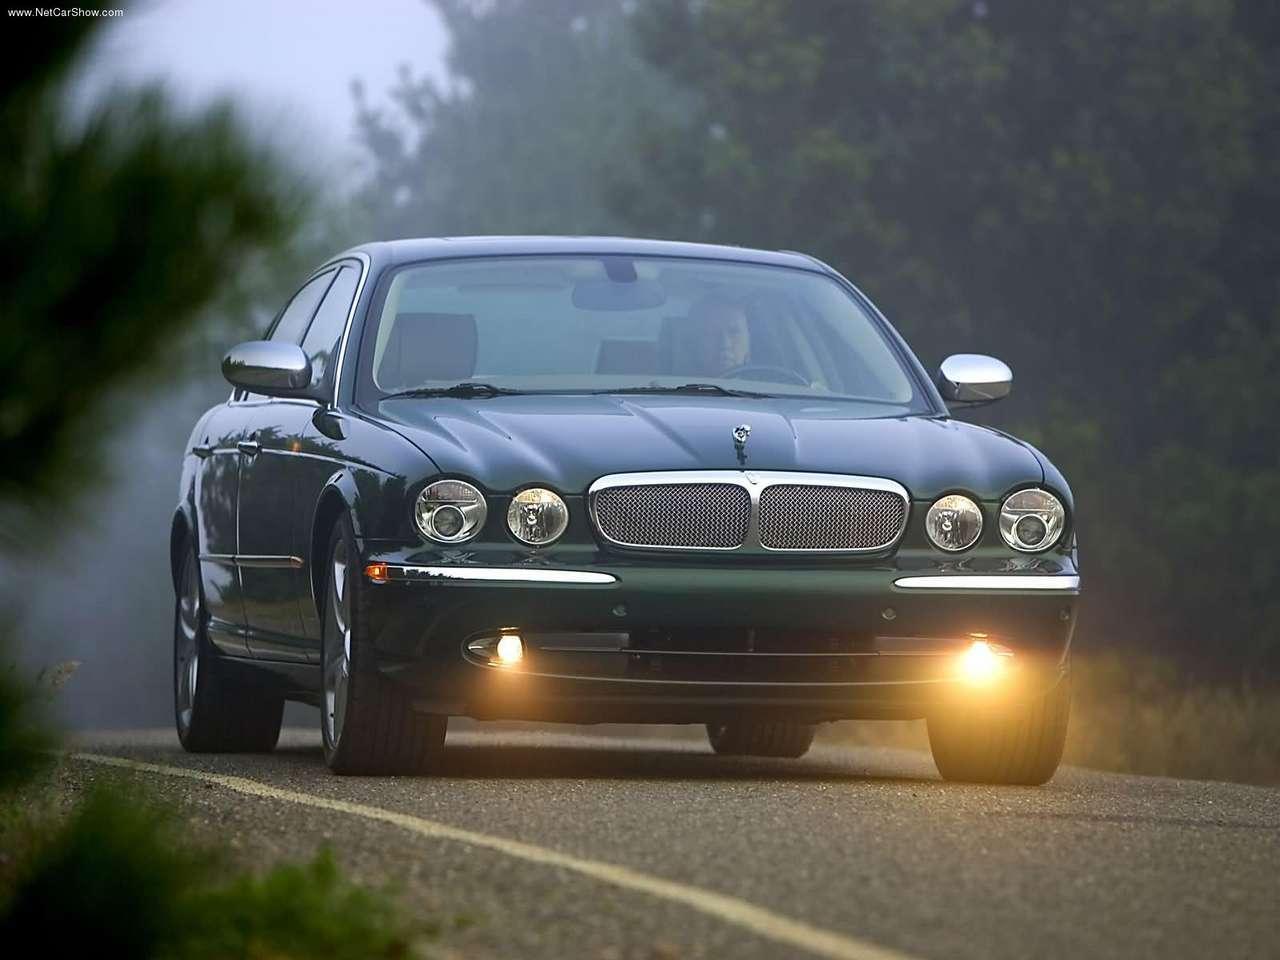 http://3.bp.blogspot.com/-cvlss7g1r2c/TZlju9B4leI/AAAAAAAACf8/yjDxnwTI_g8/s1600/Jaguar-XJ_Super_V8_2005_1280x960_wallpaper_05.jpg